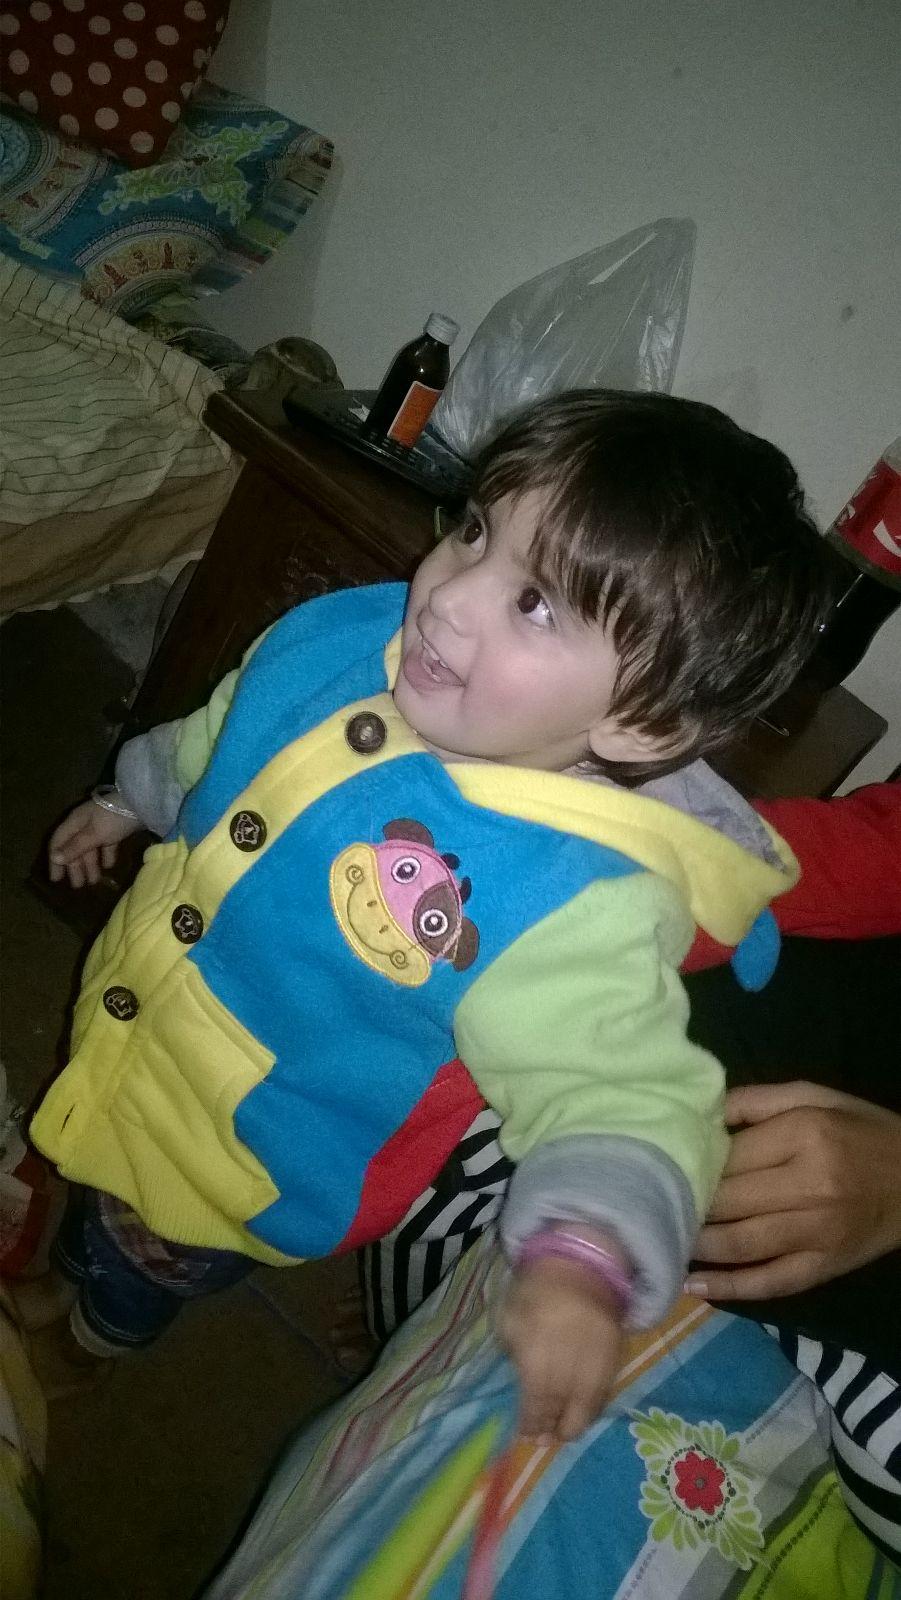 rania saleem randhawa - very cute baby images - rania saleem - cute